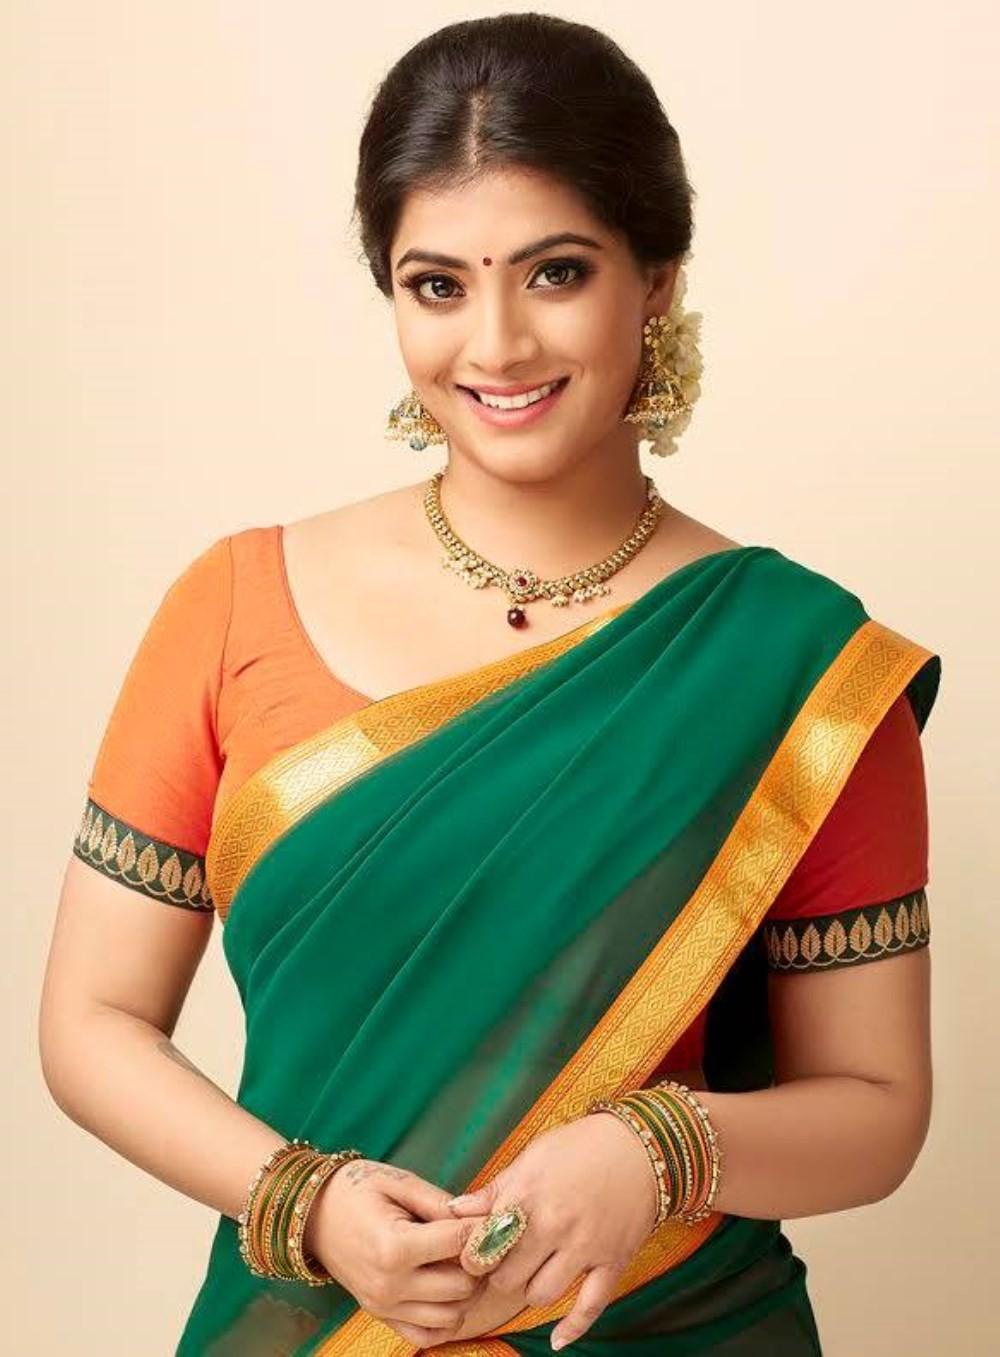 1470402060_check-out-latest-stills-actress-varalaxmi-sarathkumar